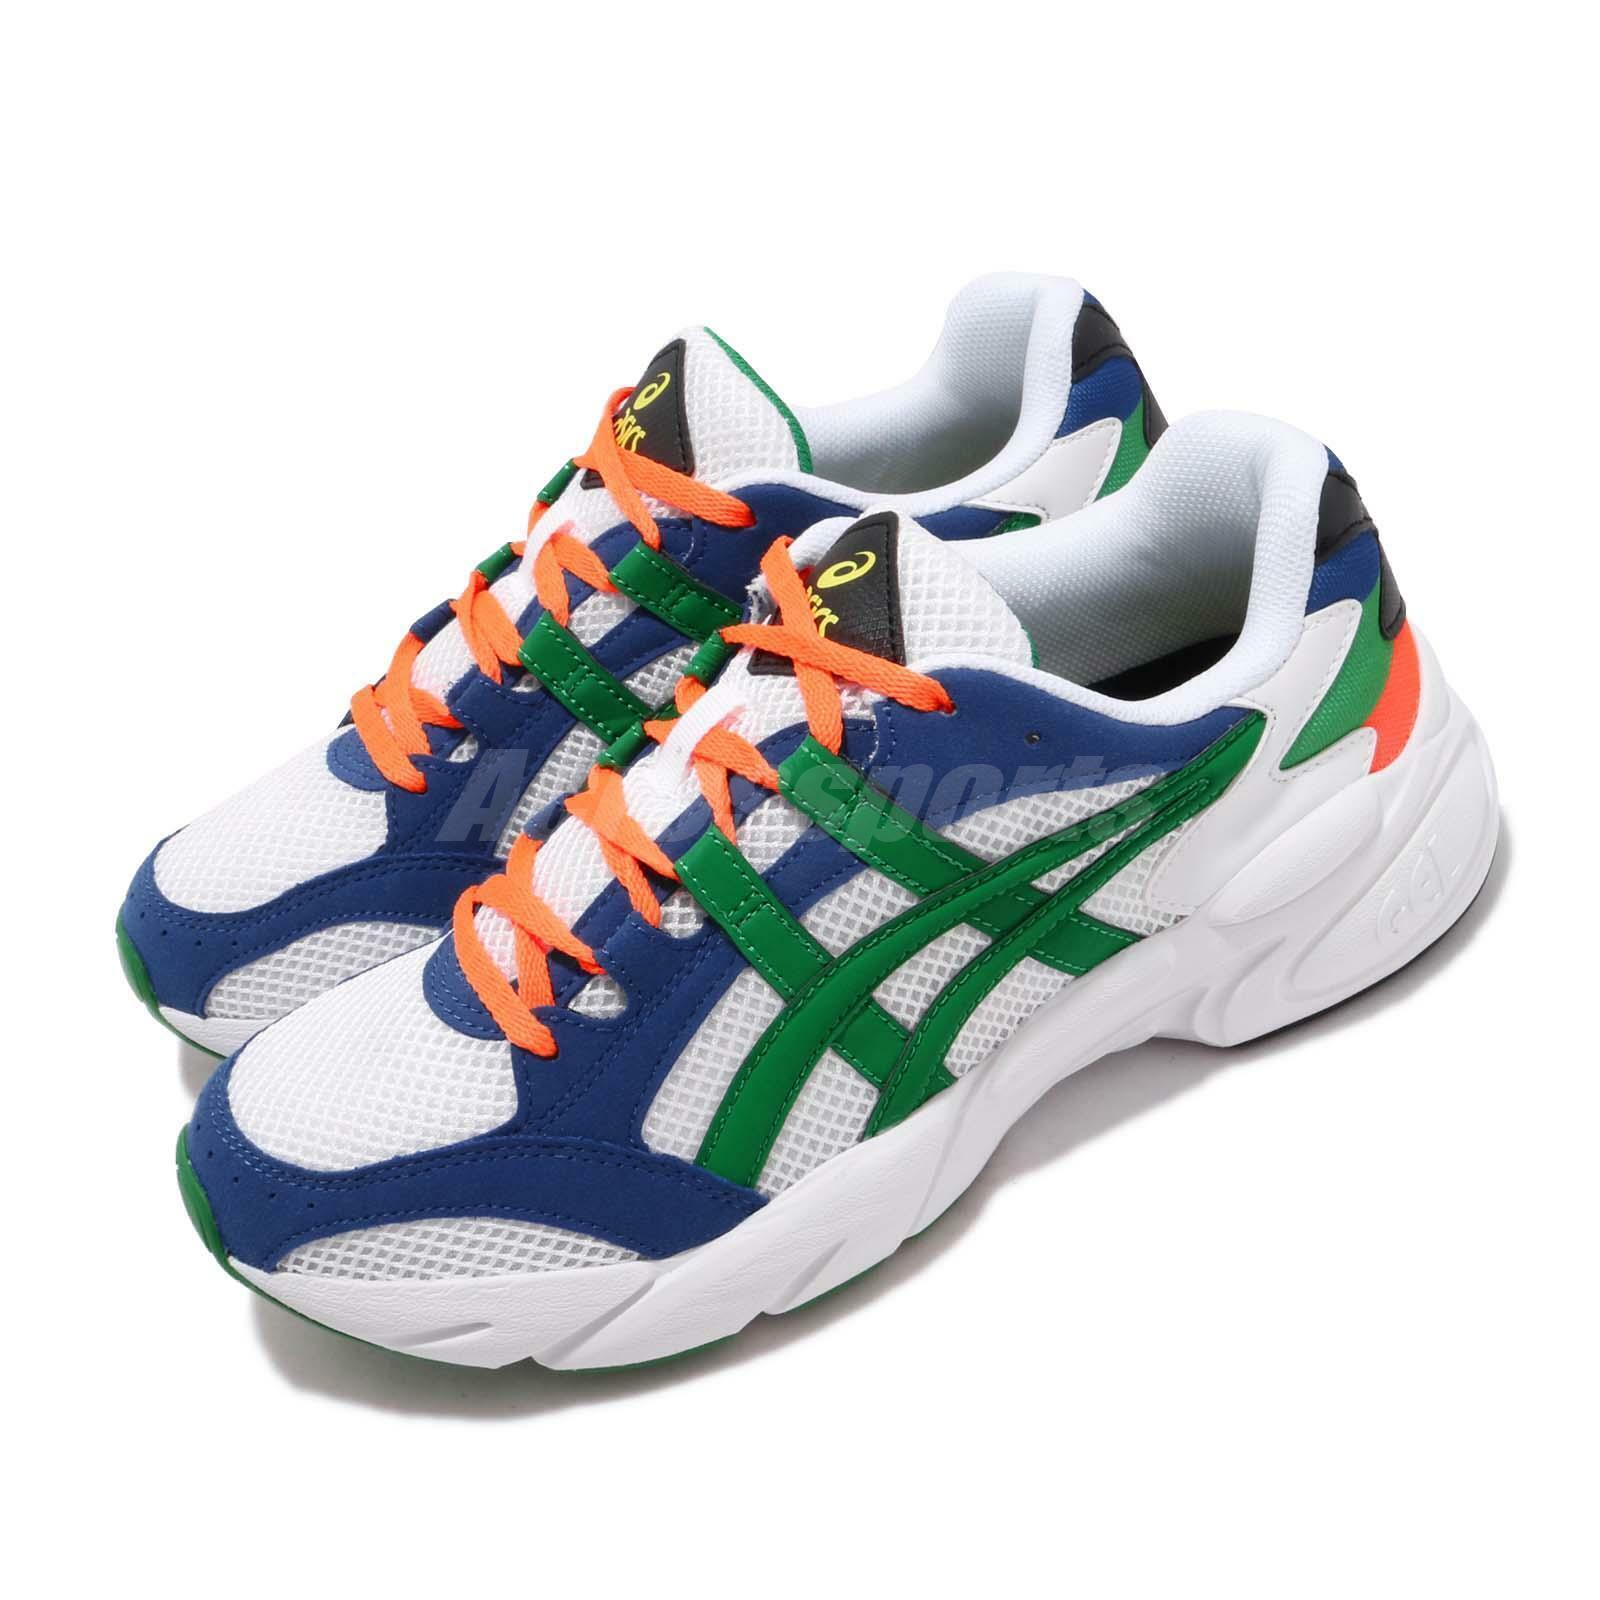 Asics Gel-Bnd blanco verde azul naranja Men Running Chunky zapatos 1021A145-100